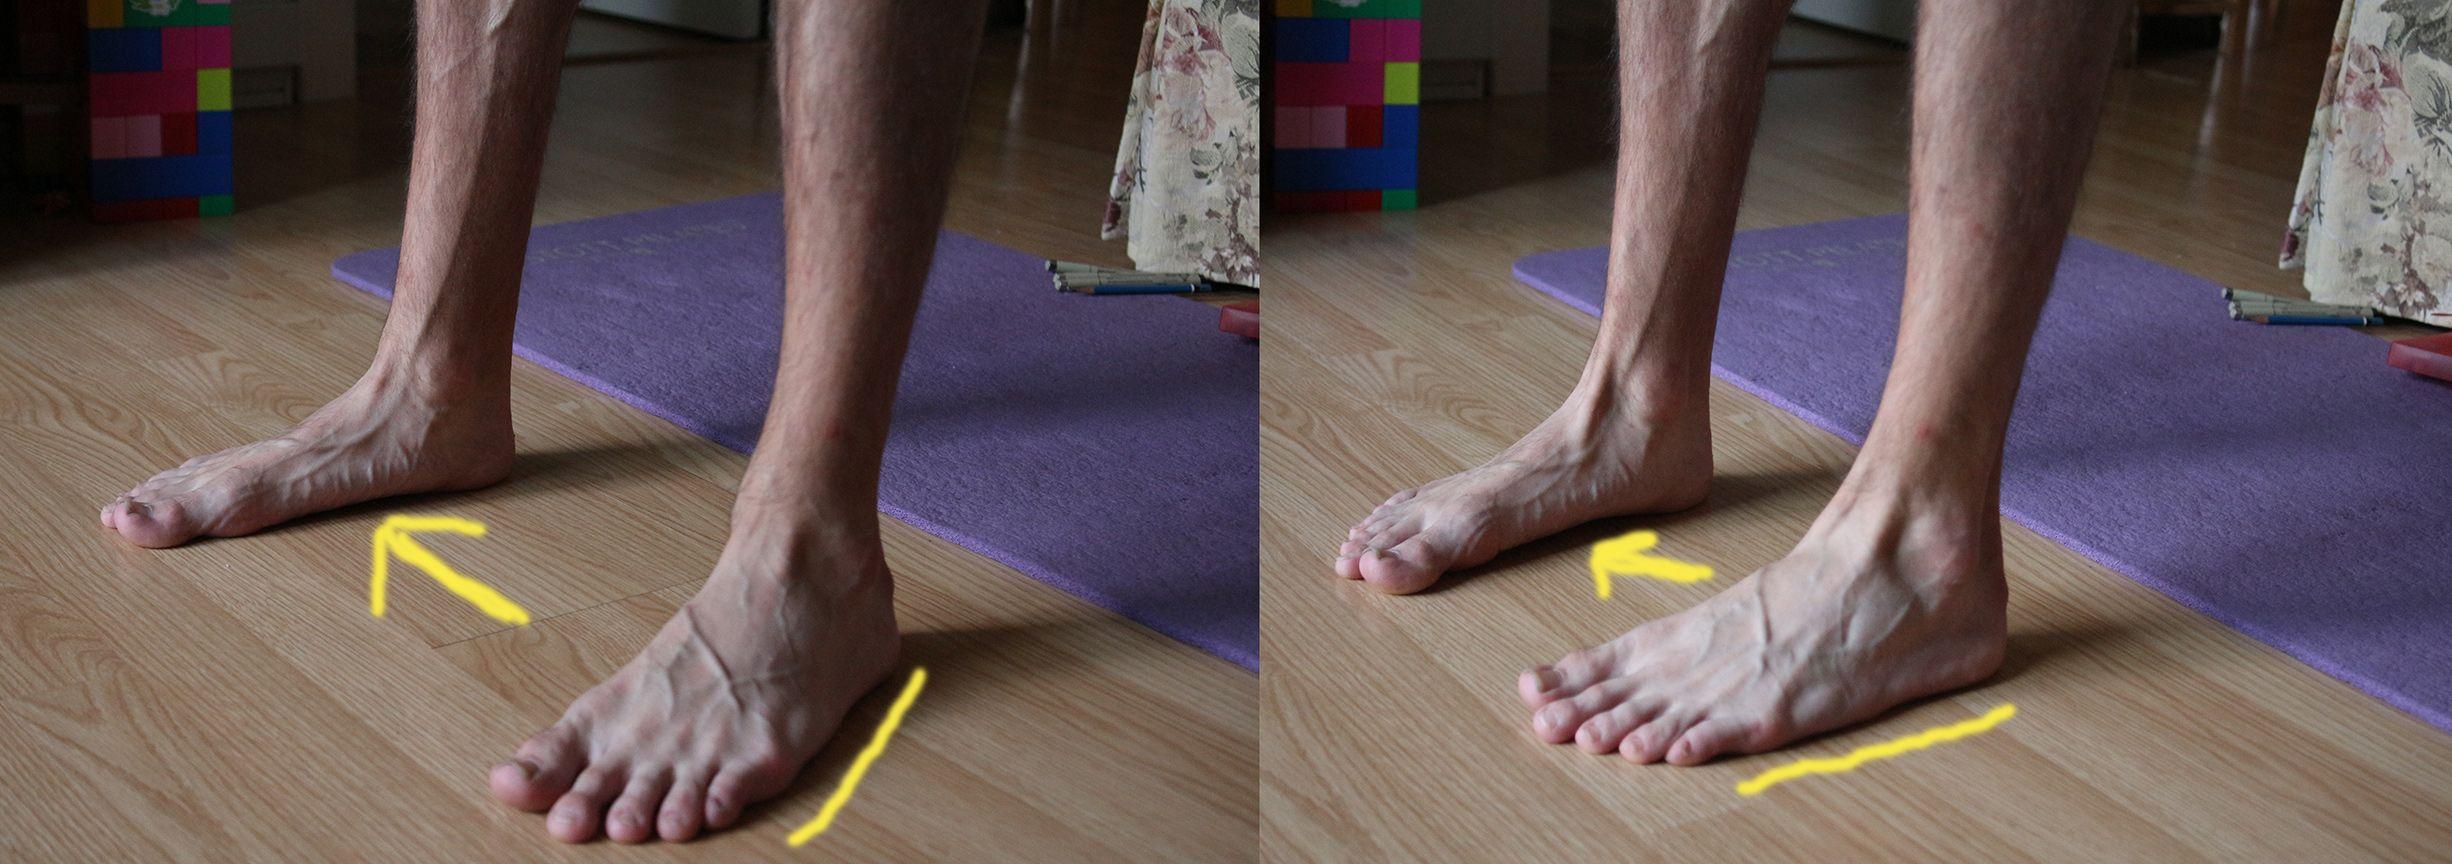 Fixing flat feet in a second literally flat feet